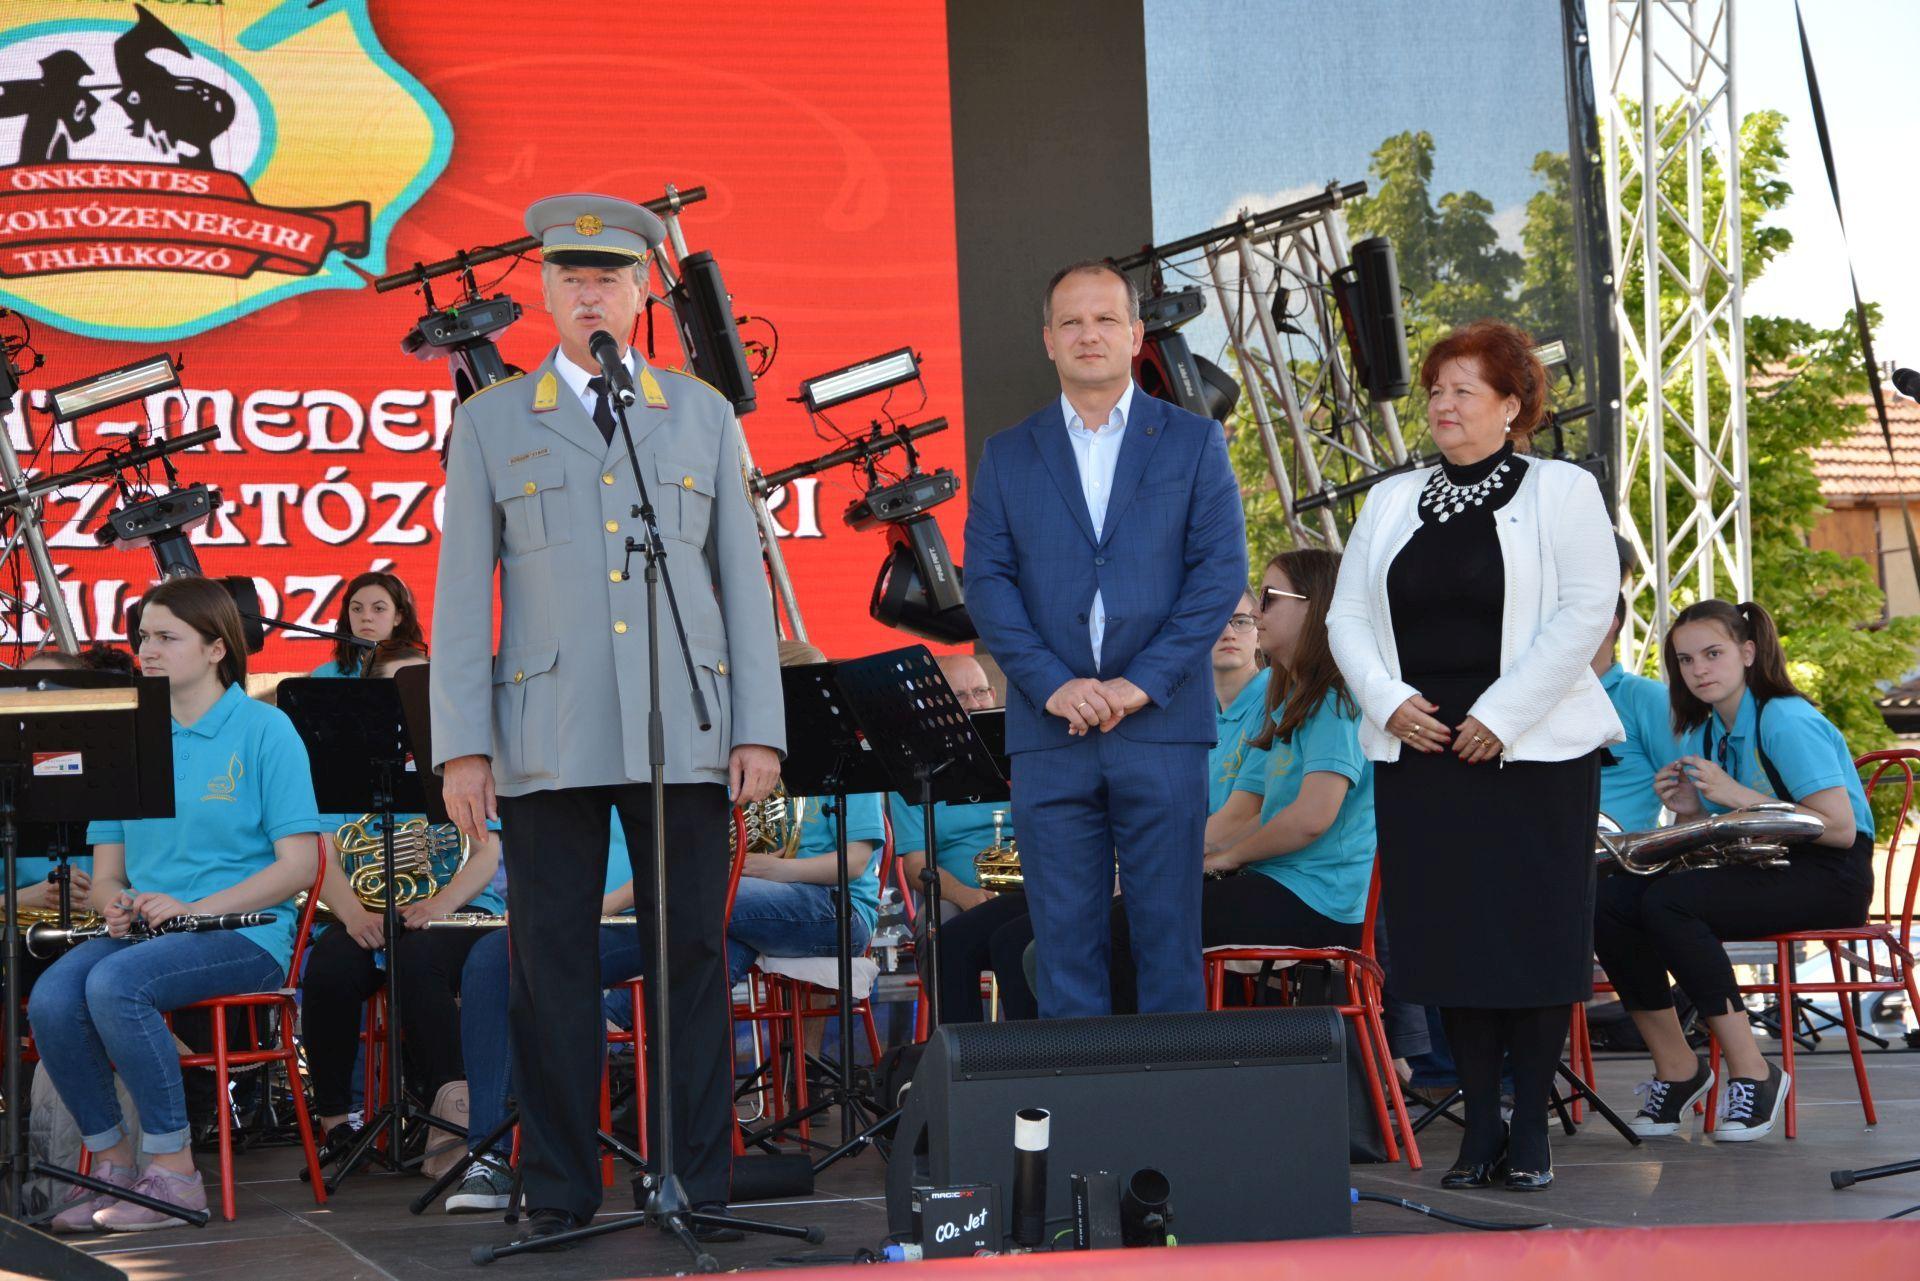 Dobson Tibor tű. dandártábornok beszéde